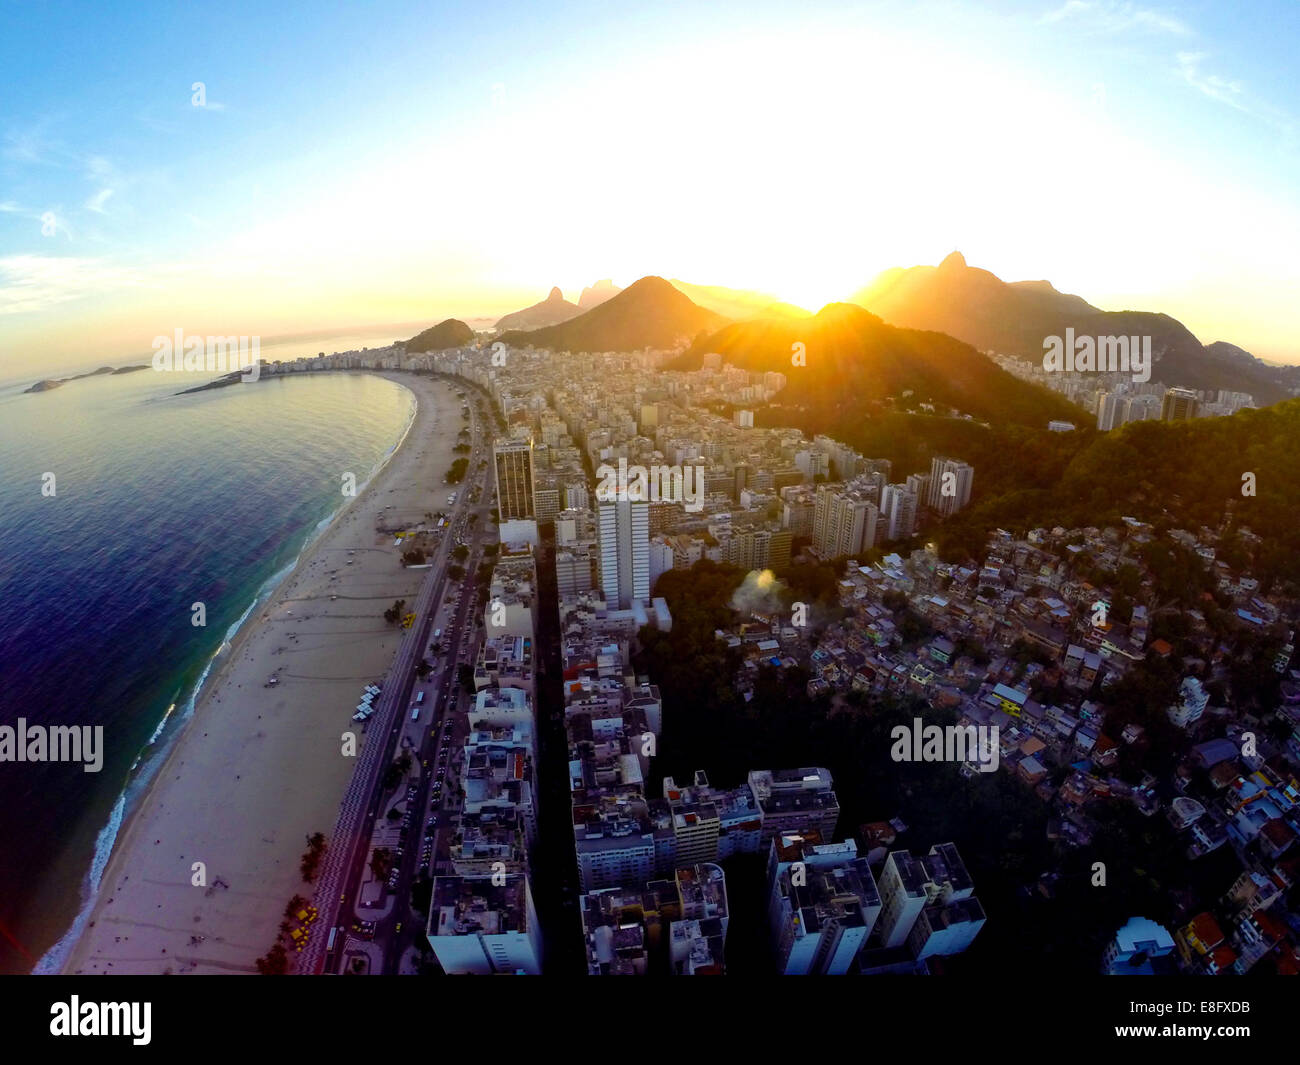 Brazil, Rio de Janeiro, Aerial view of Copacabana Beach at sunset - Stock Image